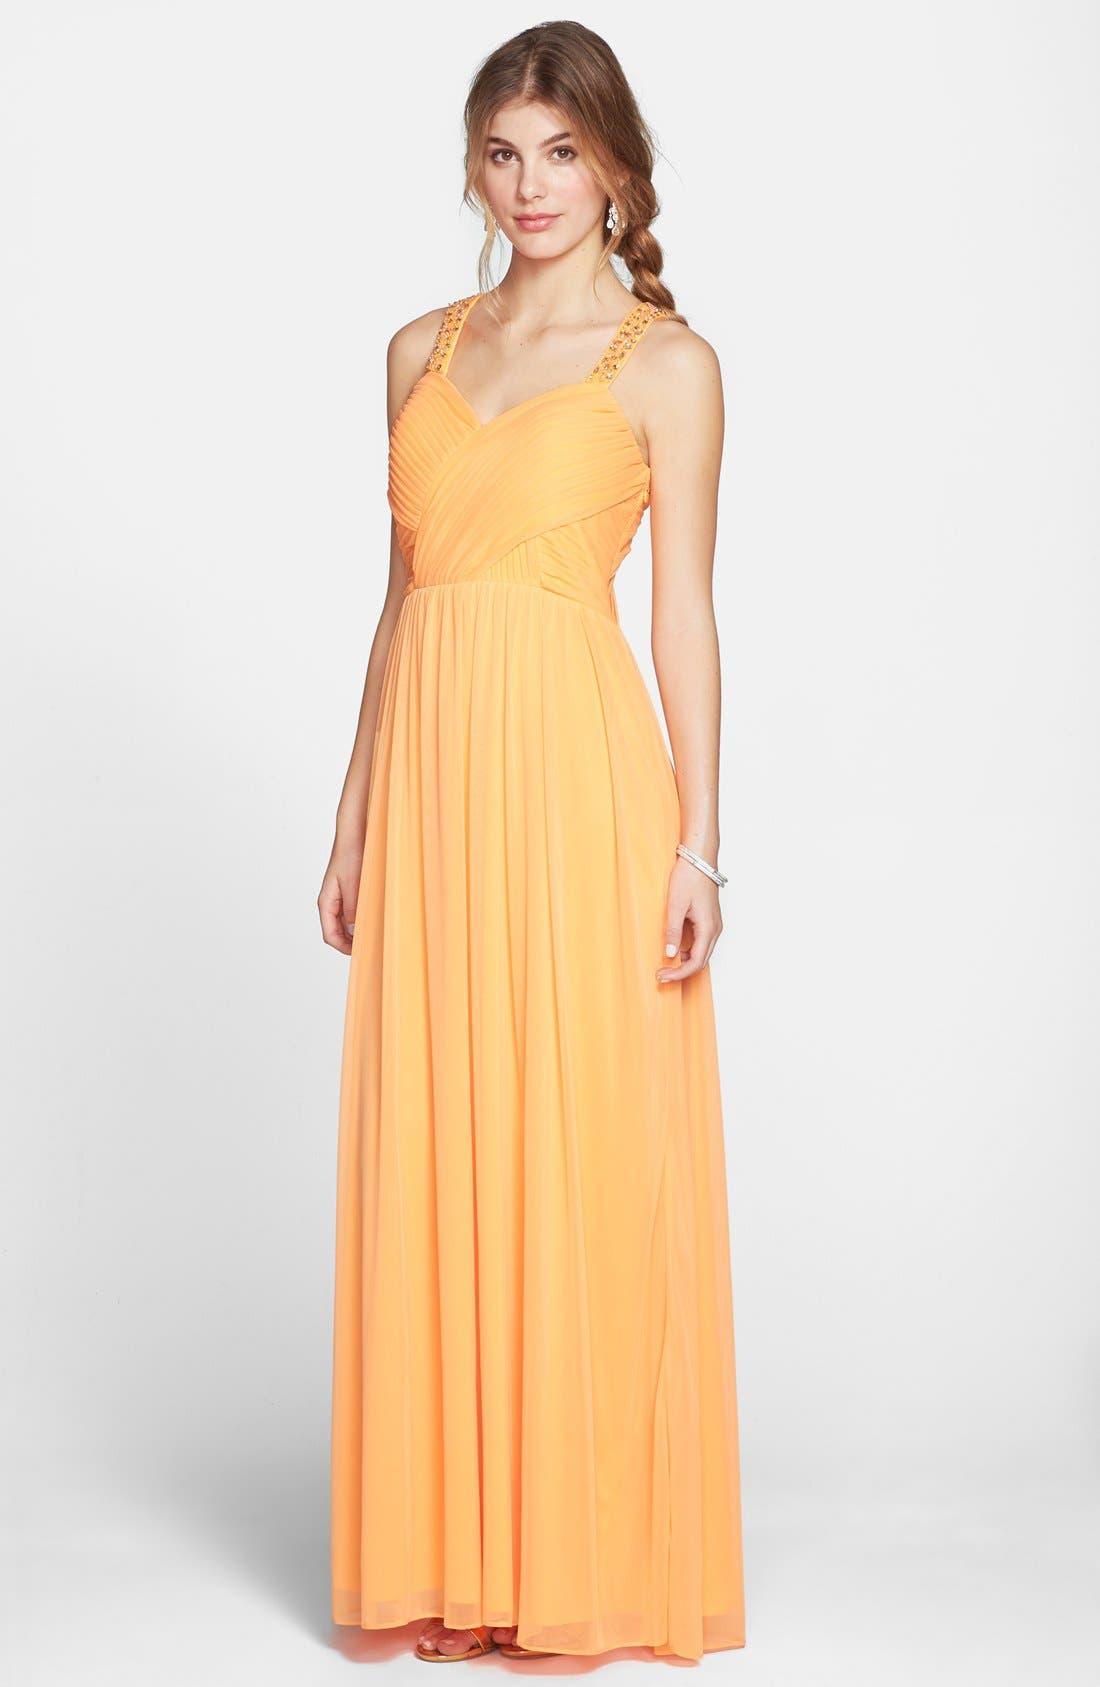 Alternate Image 1 Selected - Hailey Logan 'Tina' Cutout Embellished Gown (Juniors)